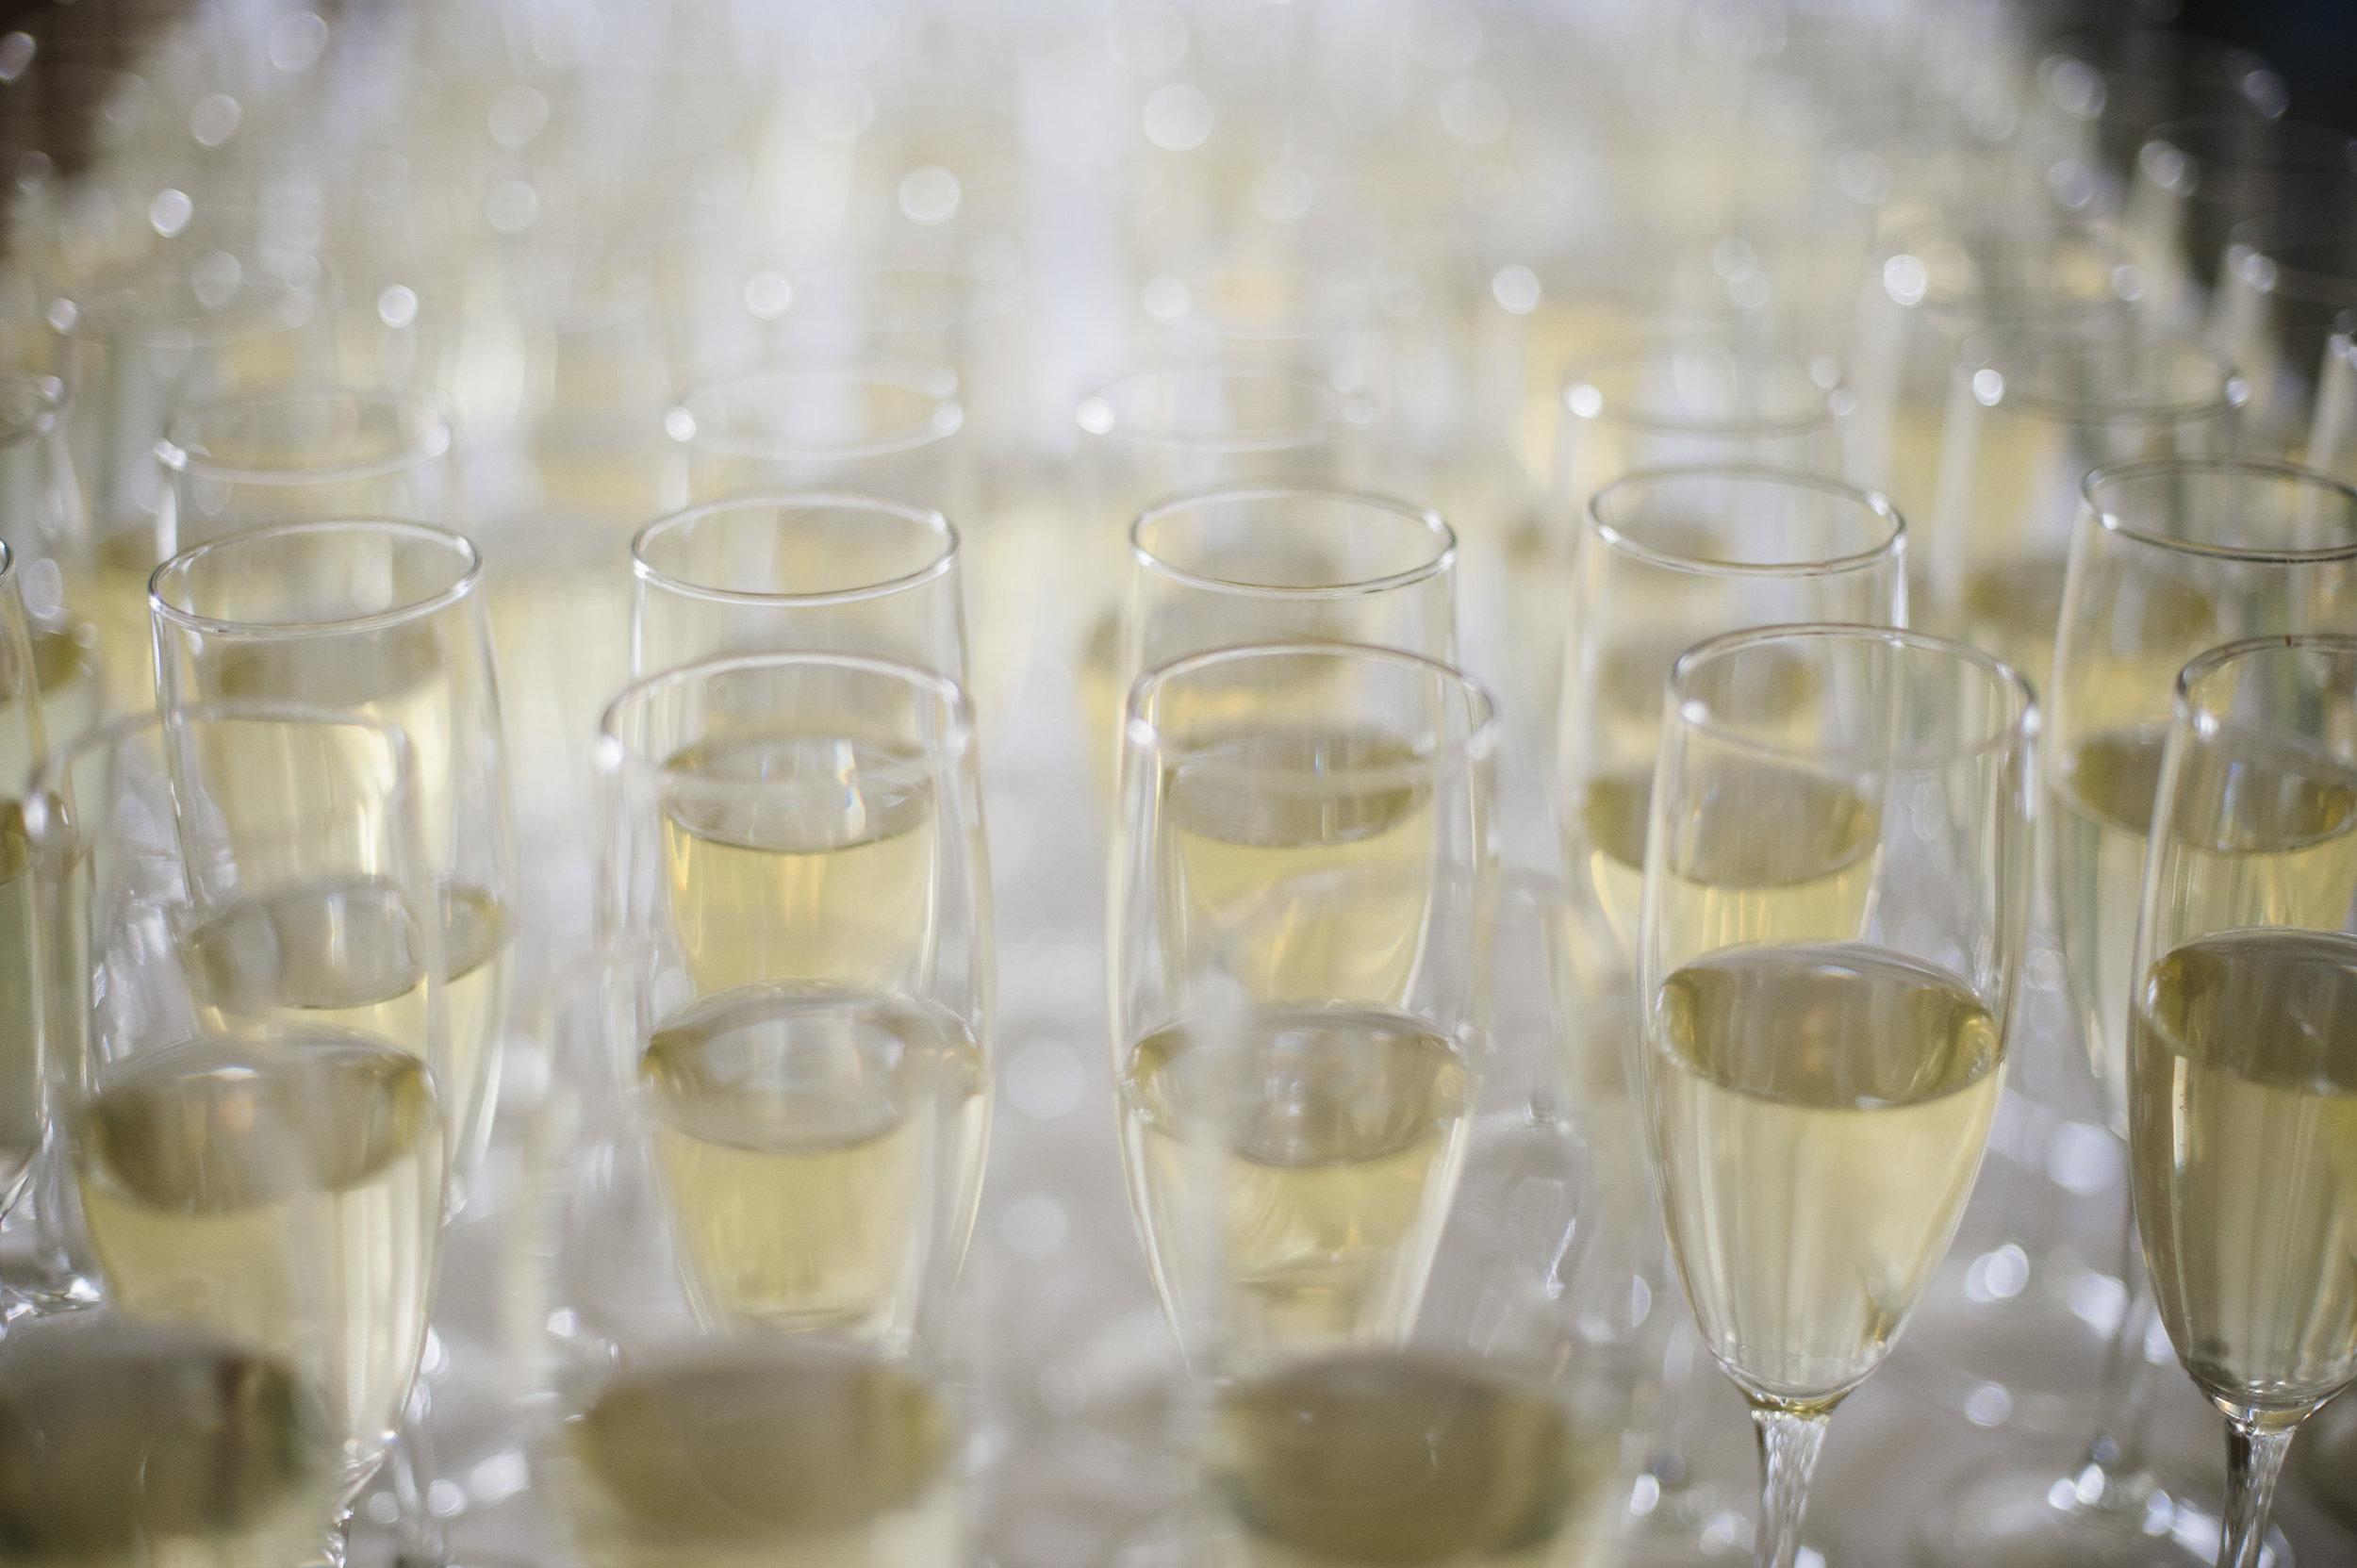 Finnriver Artisan Sparkling Cider for Couple's Toast Photo Credit: Jen Lee Light